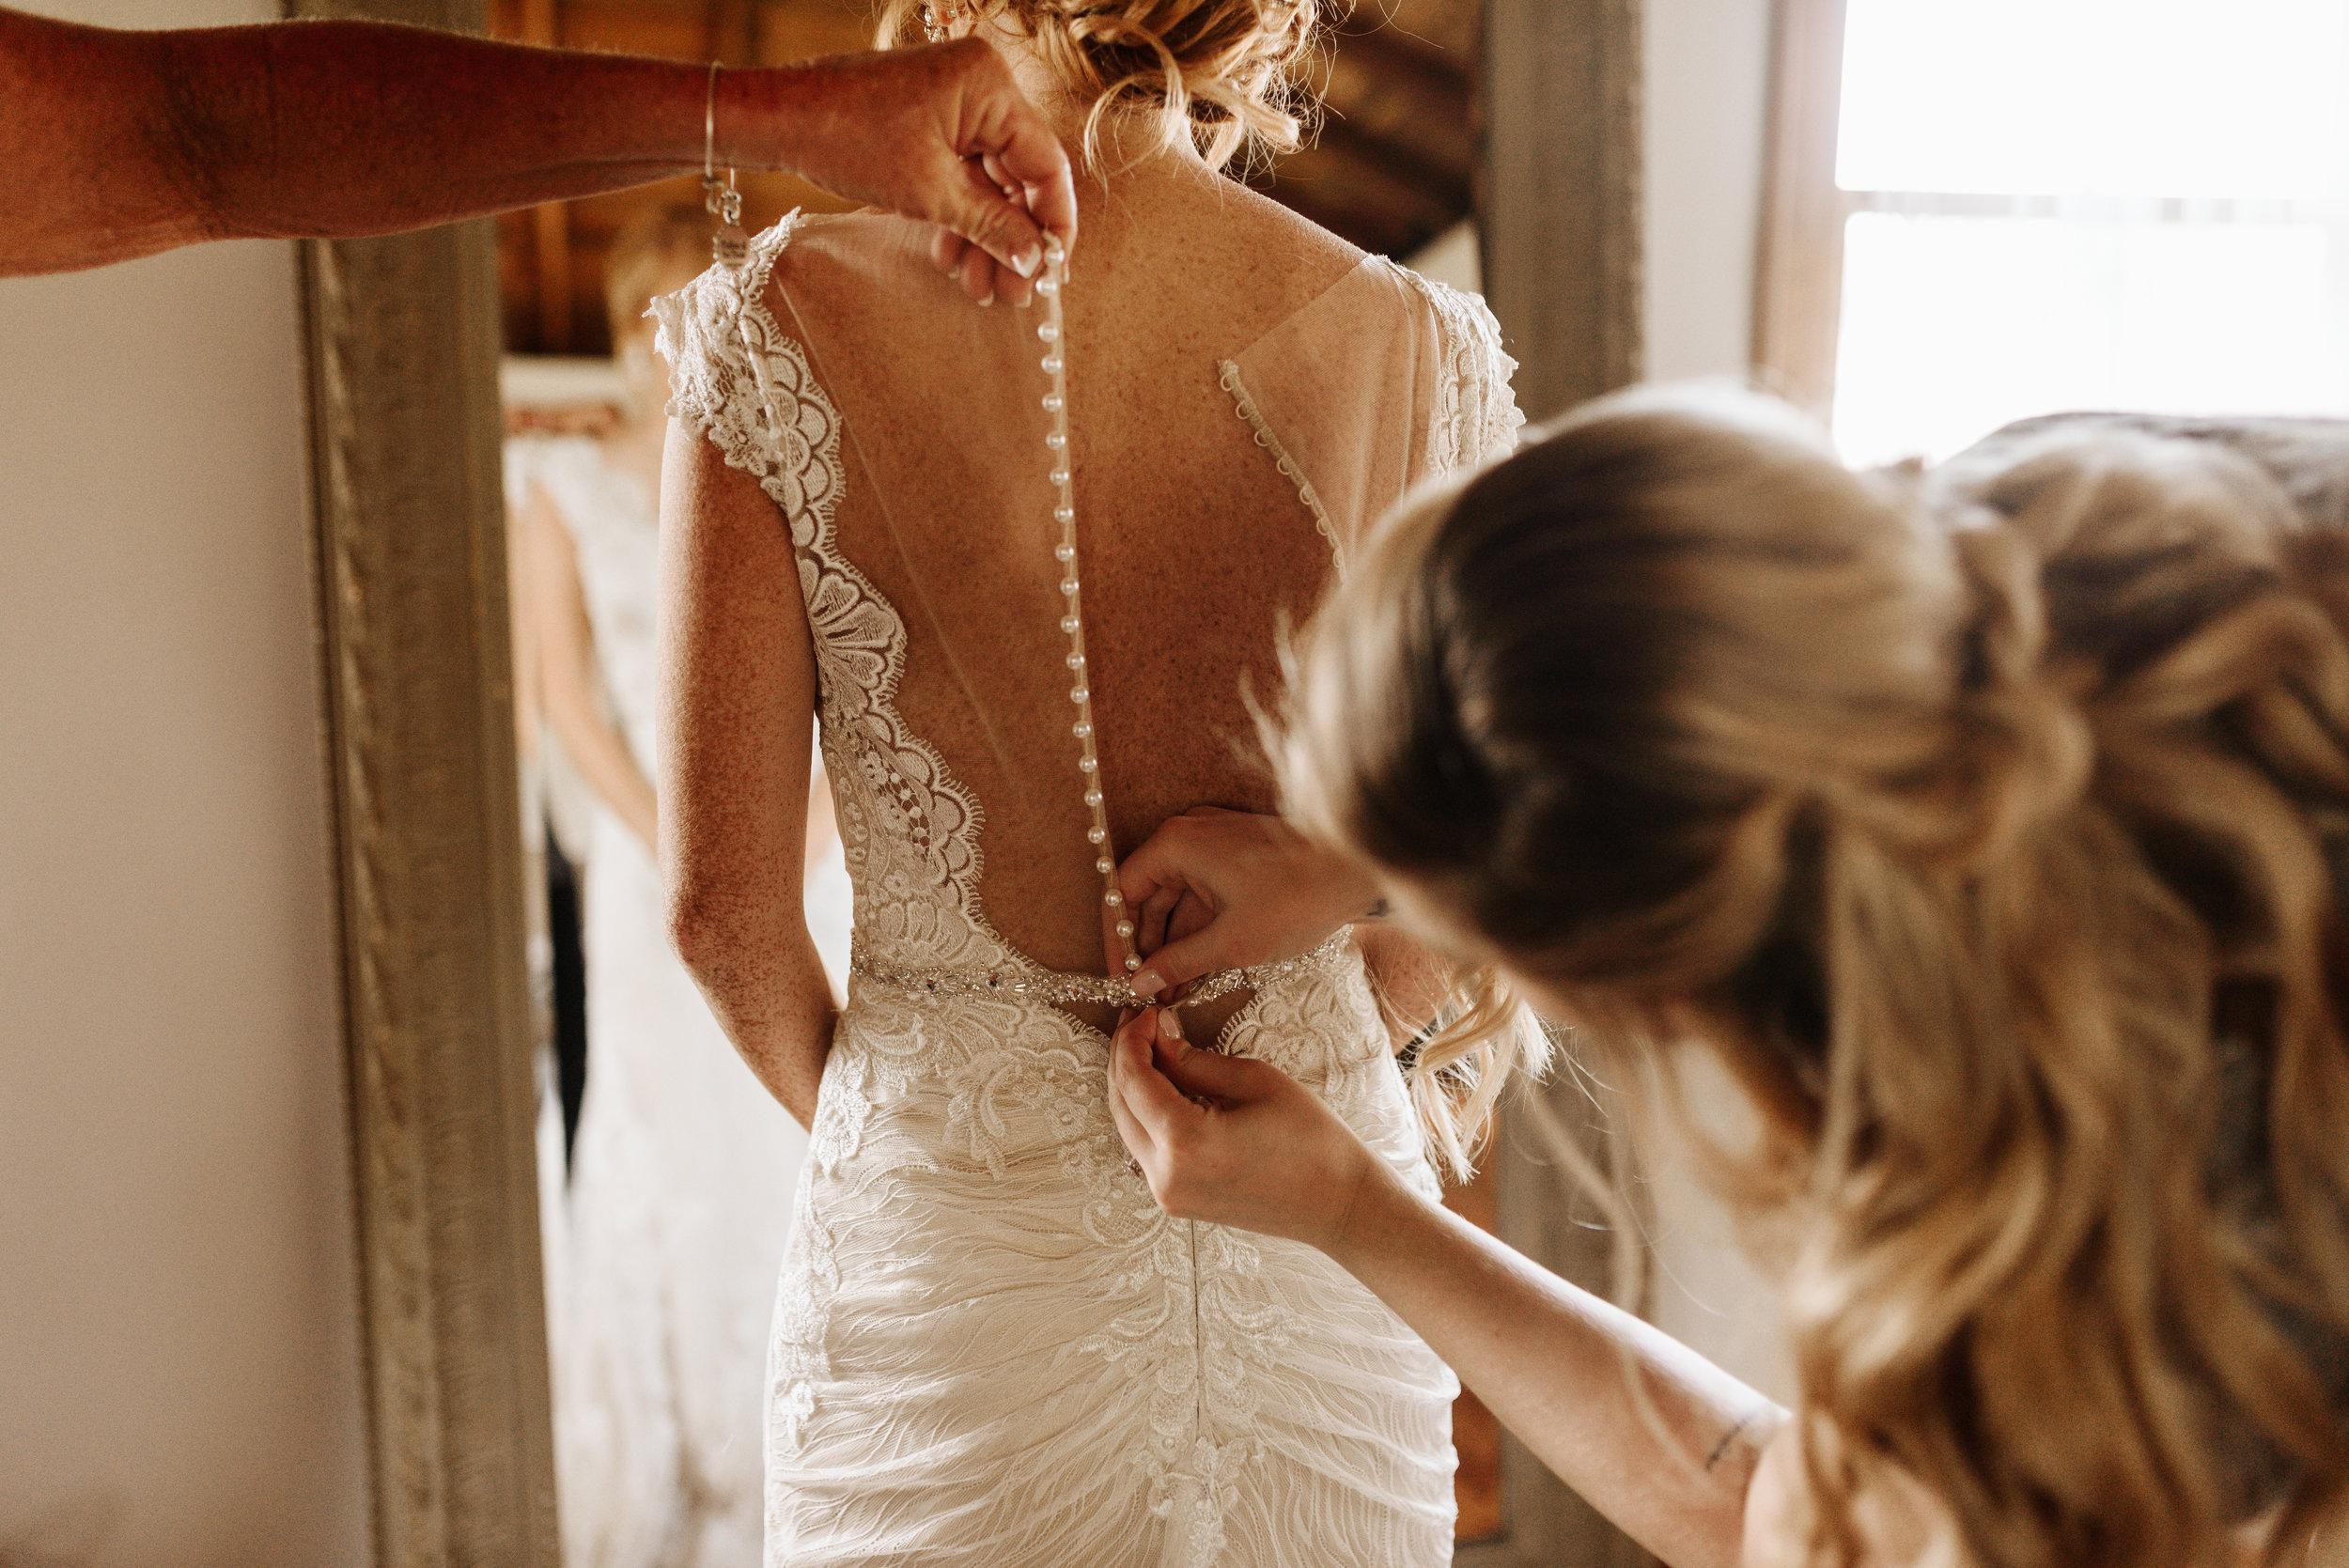 Brooke-April-Wedding-The-Acre-Orlando-Wedding-Photographer-Photography-by-V-4779.jpg